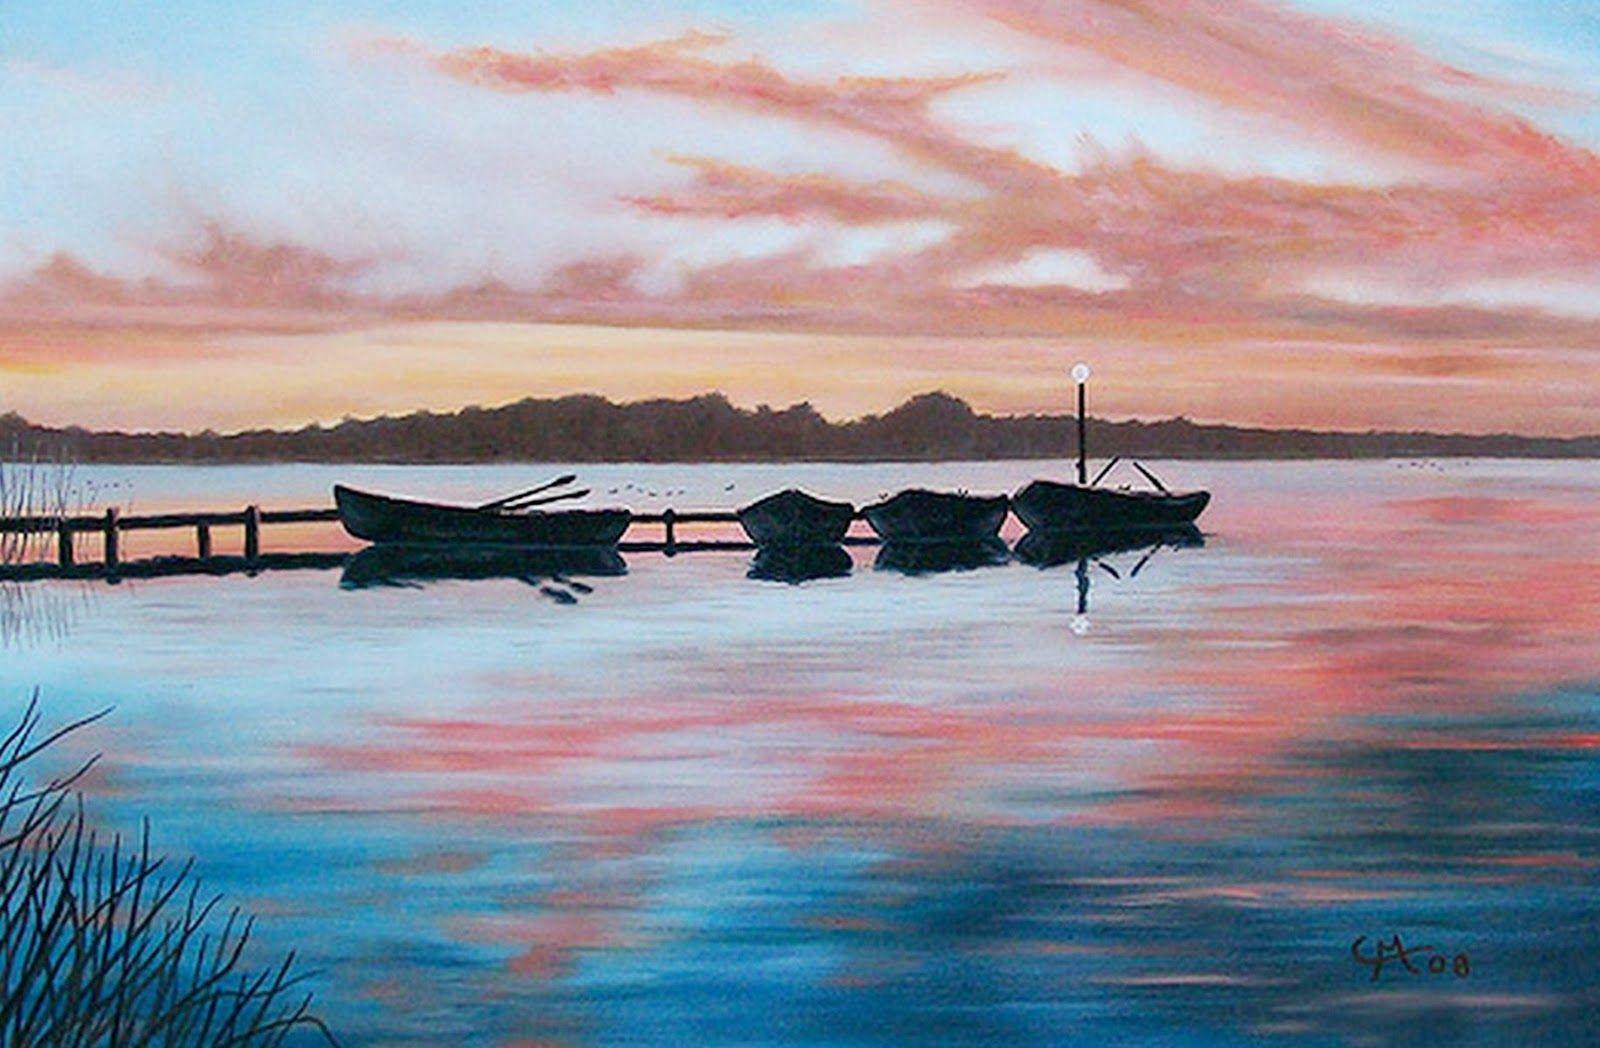 Paisajes Marinos Para Pintar Al Oleo Pintura Marina Pinturas Abstractas Pinturas Impresionistas